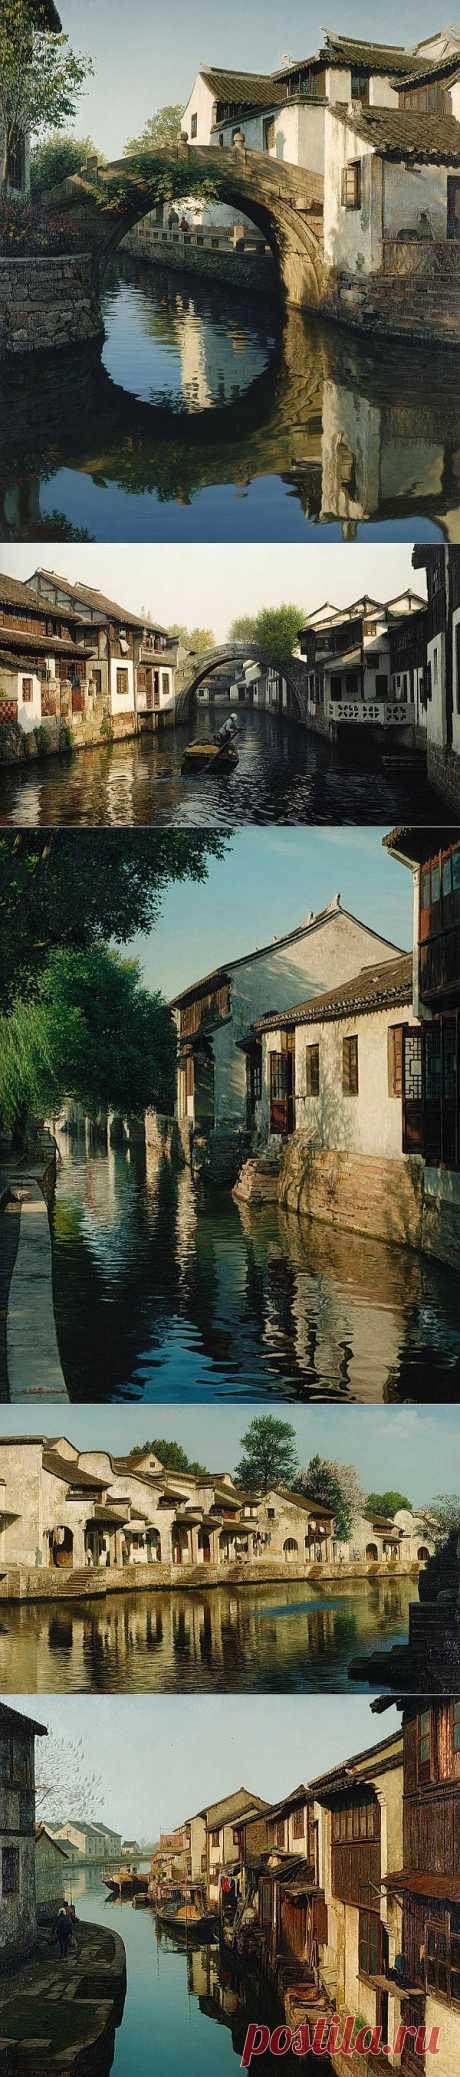 Венеция Востока - Чжоучжуану (Zhouzhuang). Художник Wang Yihua.